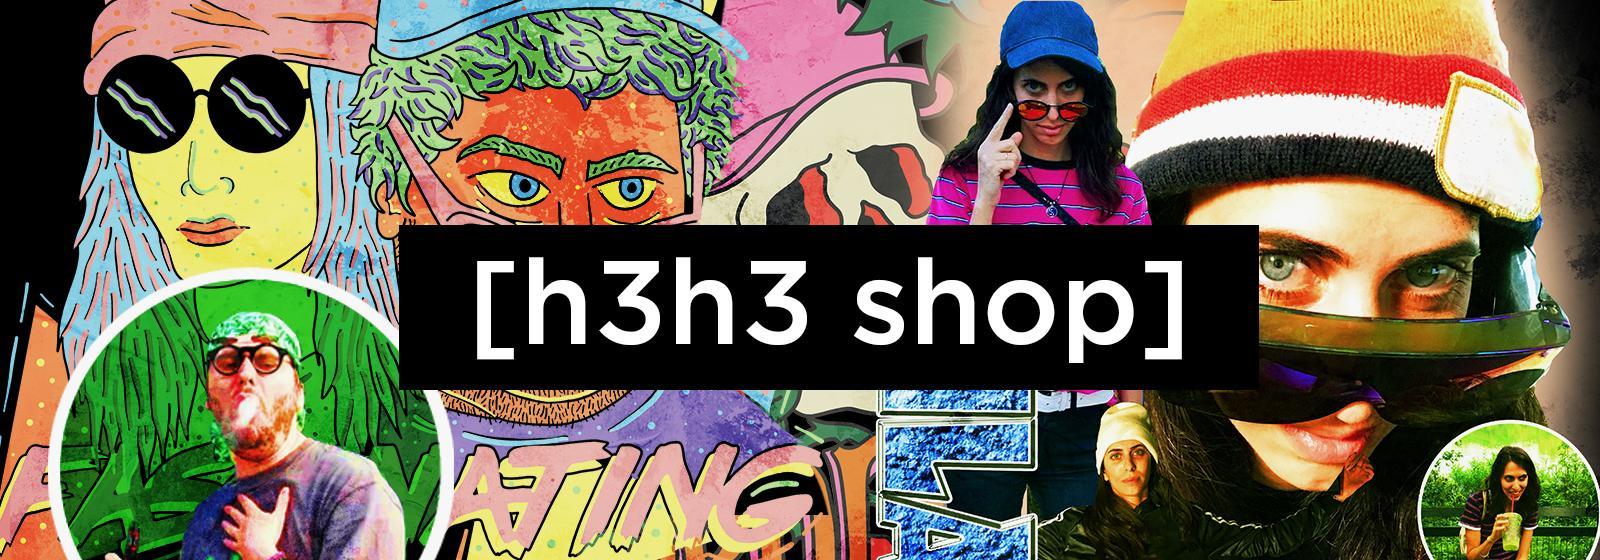 h3h3 T Shirt